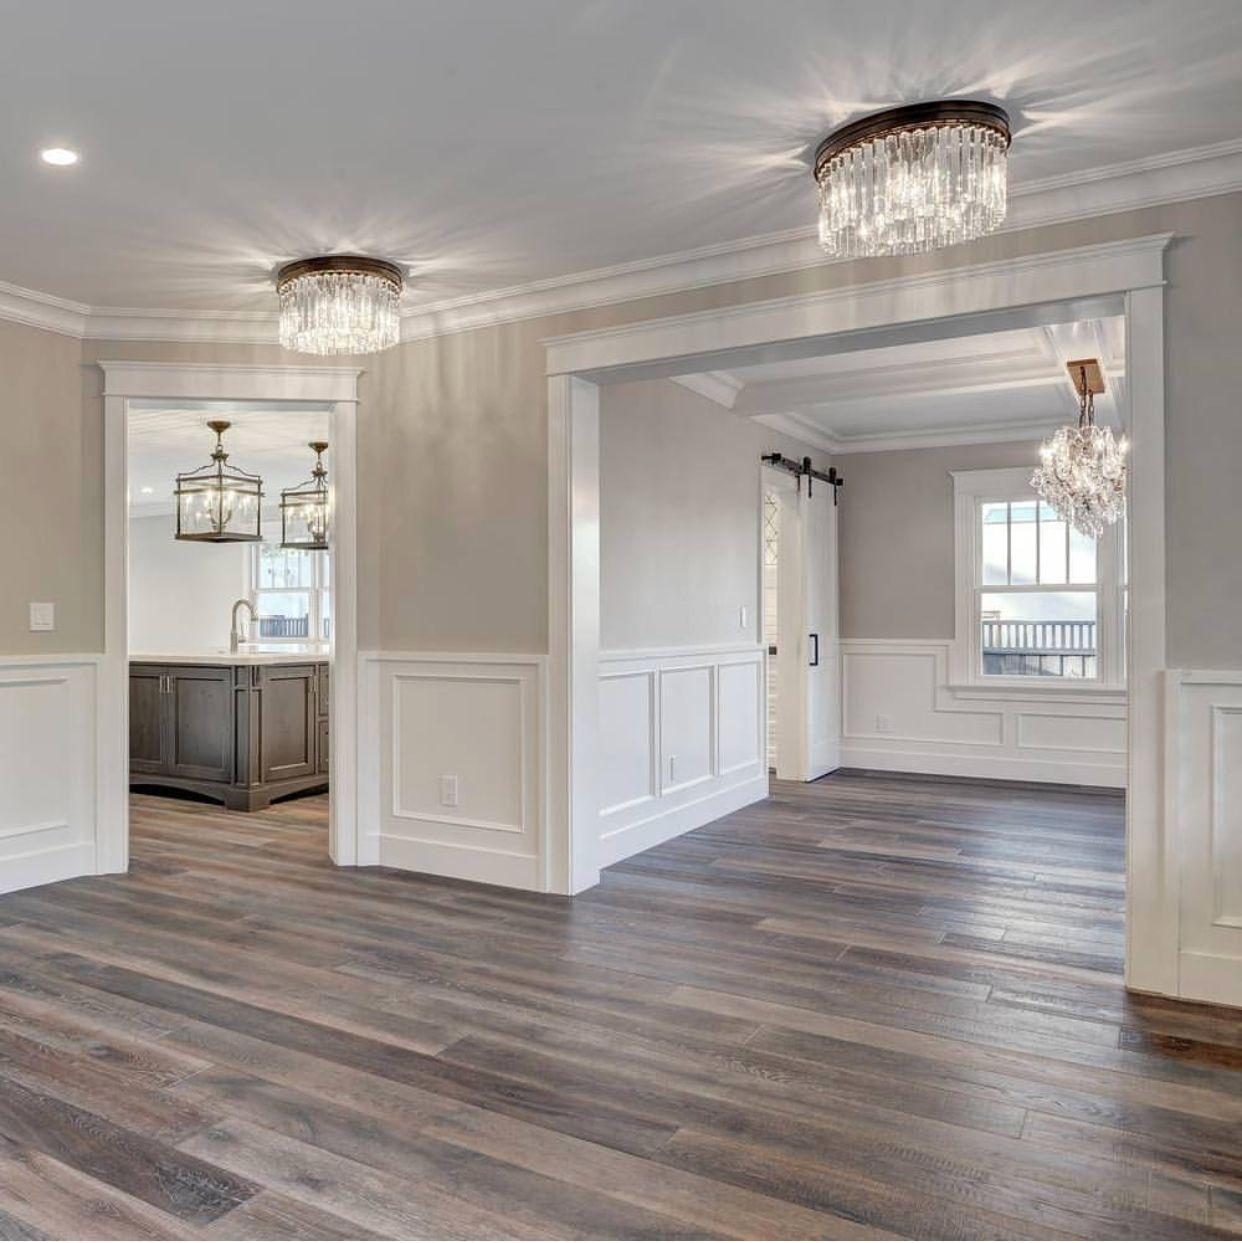 Restoration Hardware Luxury Home Decor House Styles Home